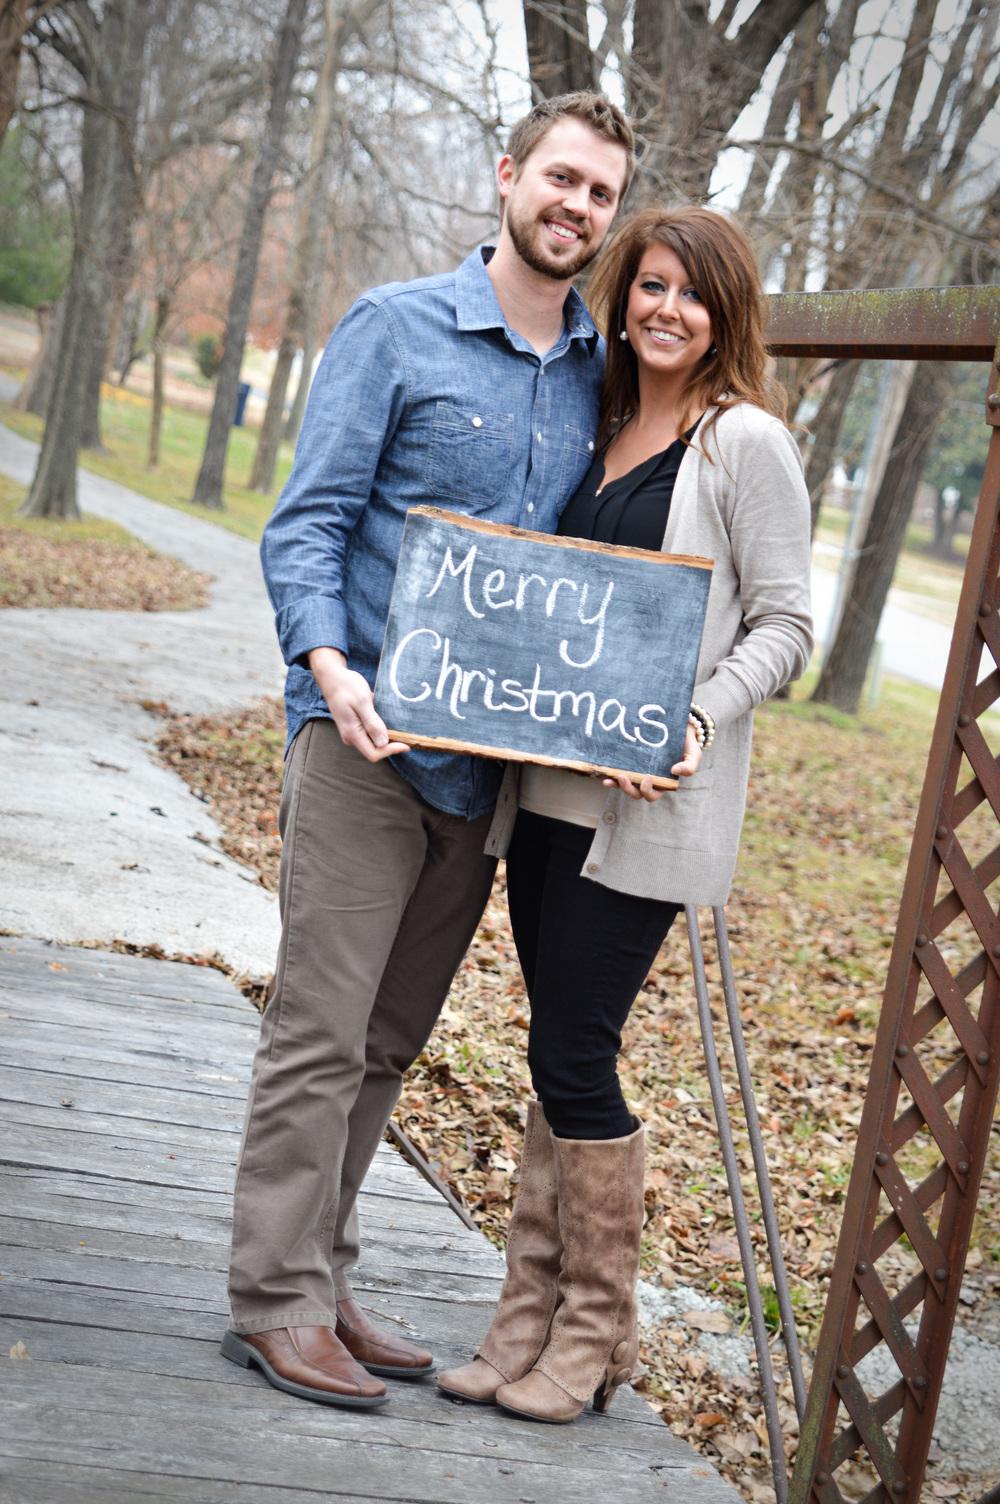 couplesphotography-merrychristmas-familyphotos-joplinmissouri-photosbyariel